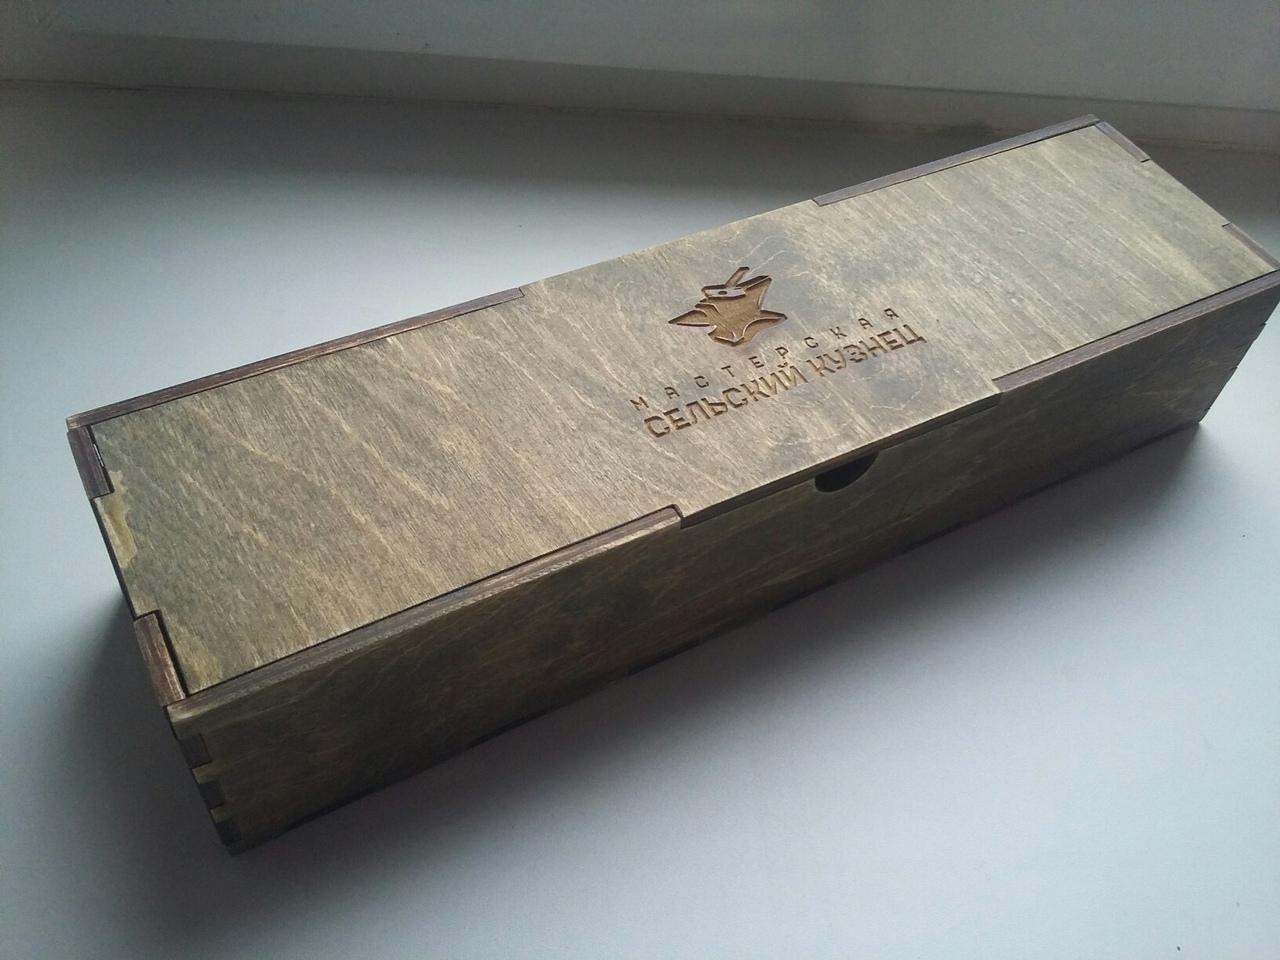 Laser Cut Wooden Knife Box Free Vector